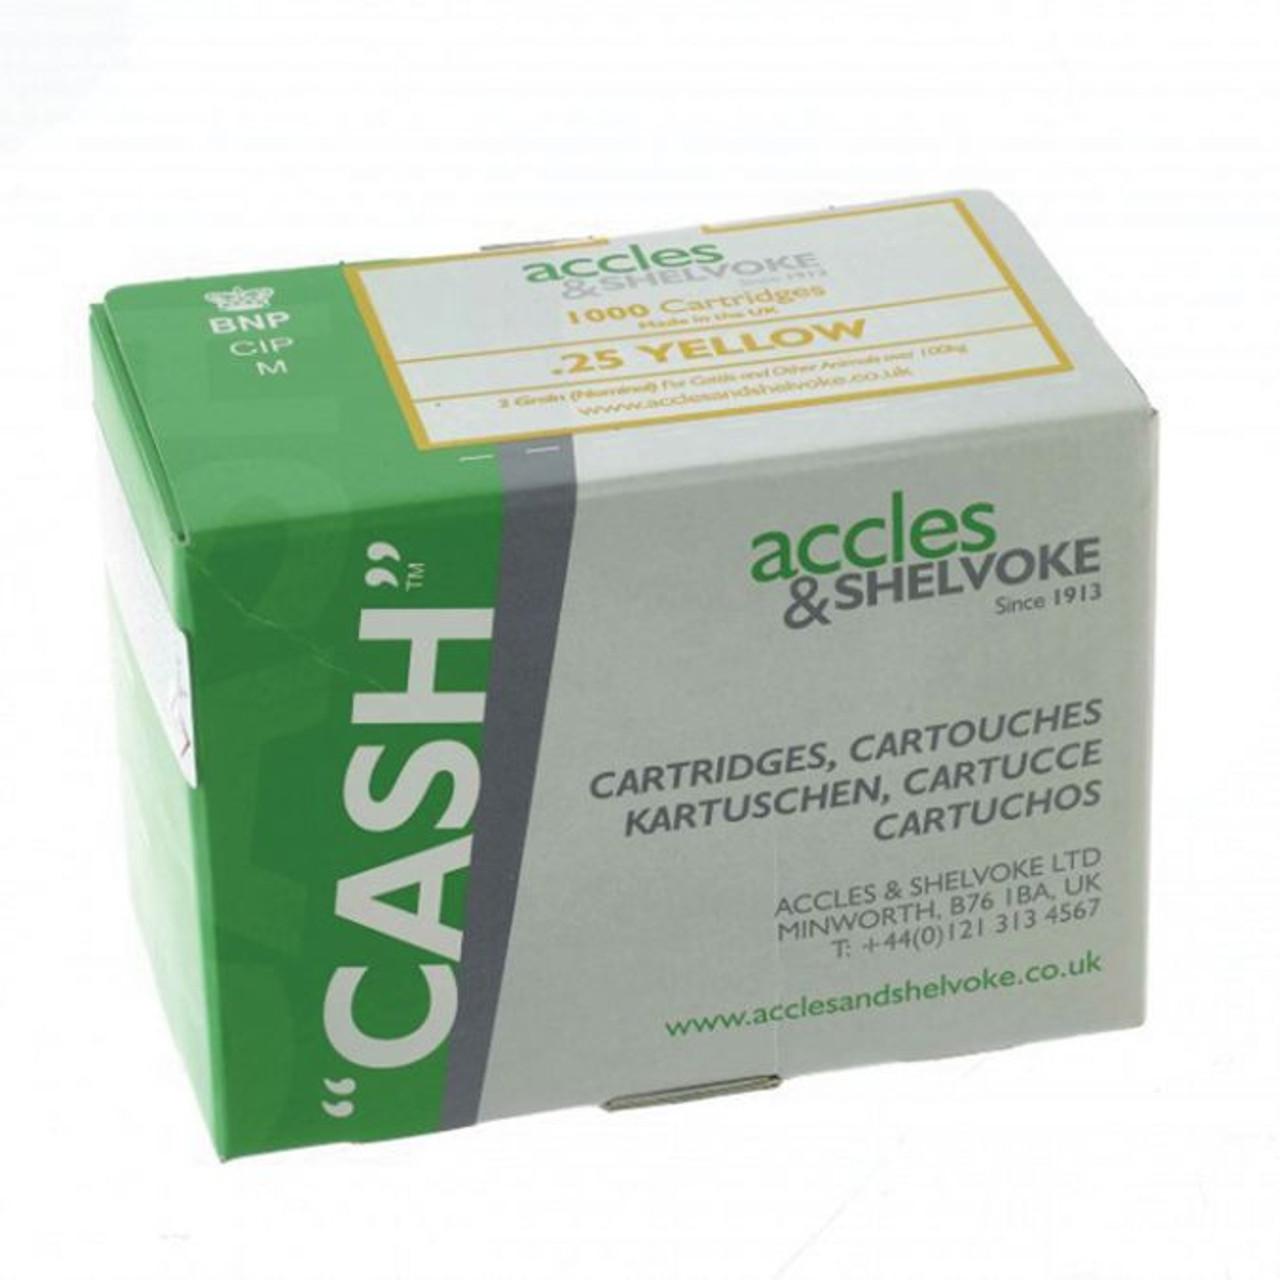 Accles & Shelvoke CASH® .25 Caliber Yellow 2 Grain Cartridges - 1,000/Box - 75-300 lbs. (Sheep, Goats, Market Hogs)